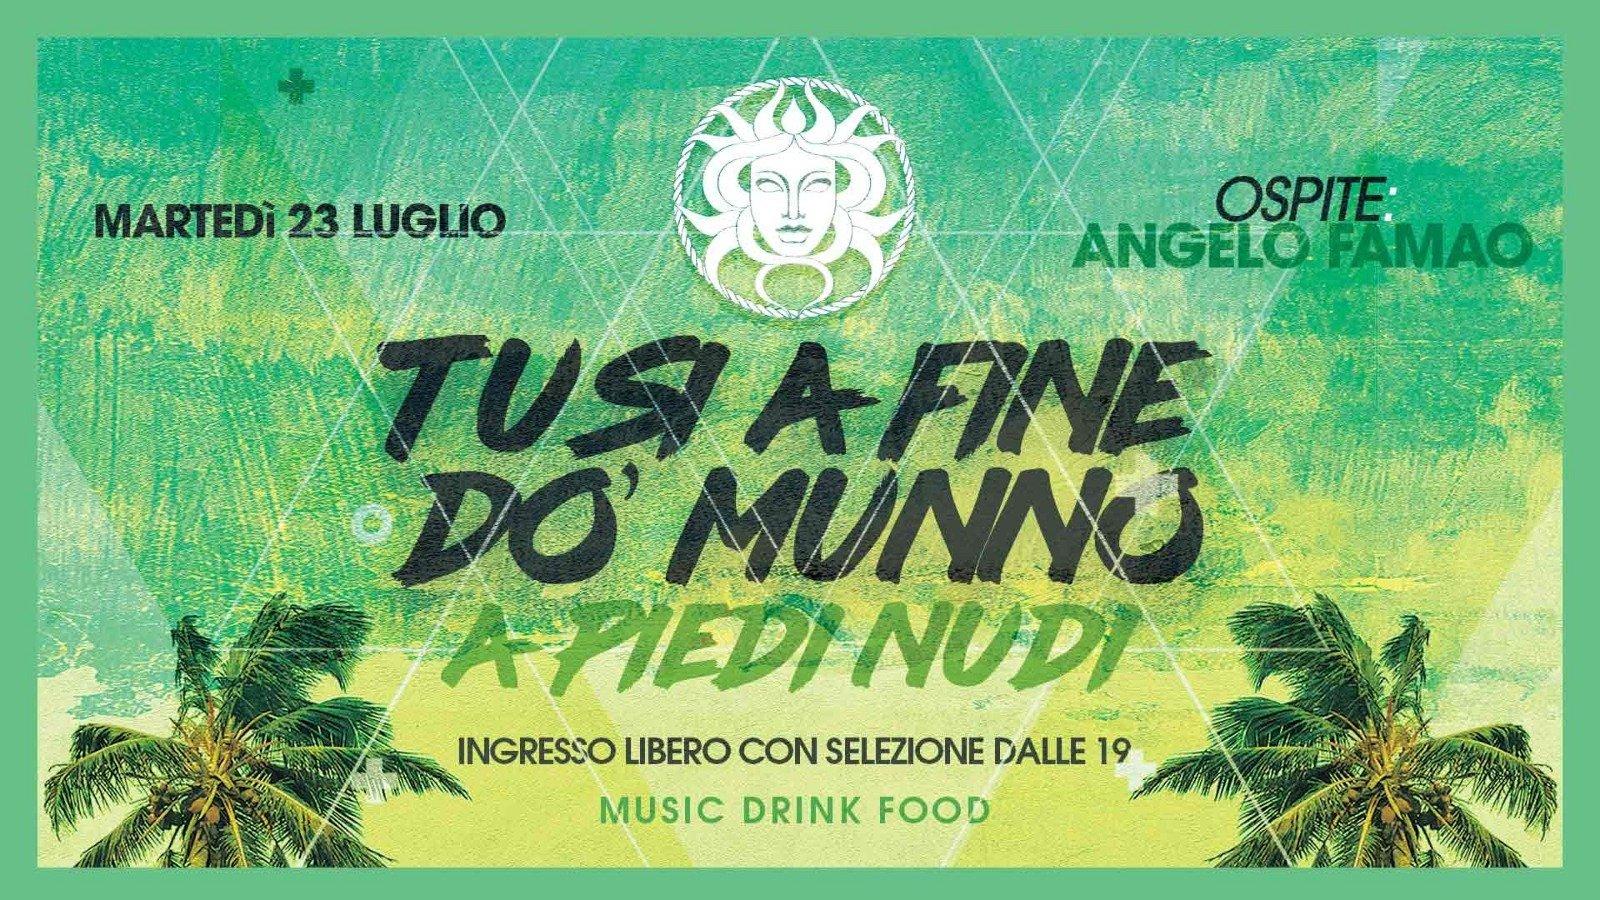 A Piedi Nudi ospite Angelo Famao Bagni Medusa Beach Club